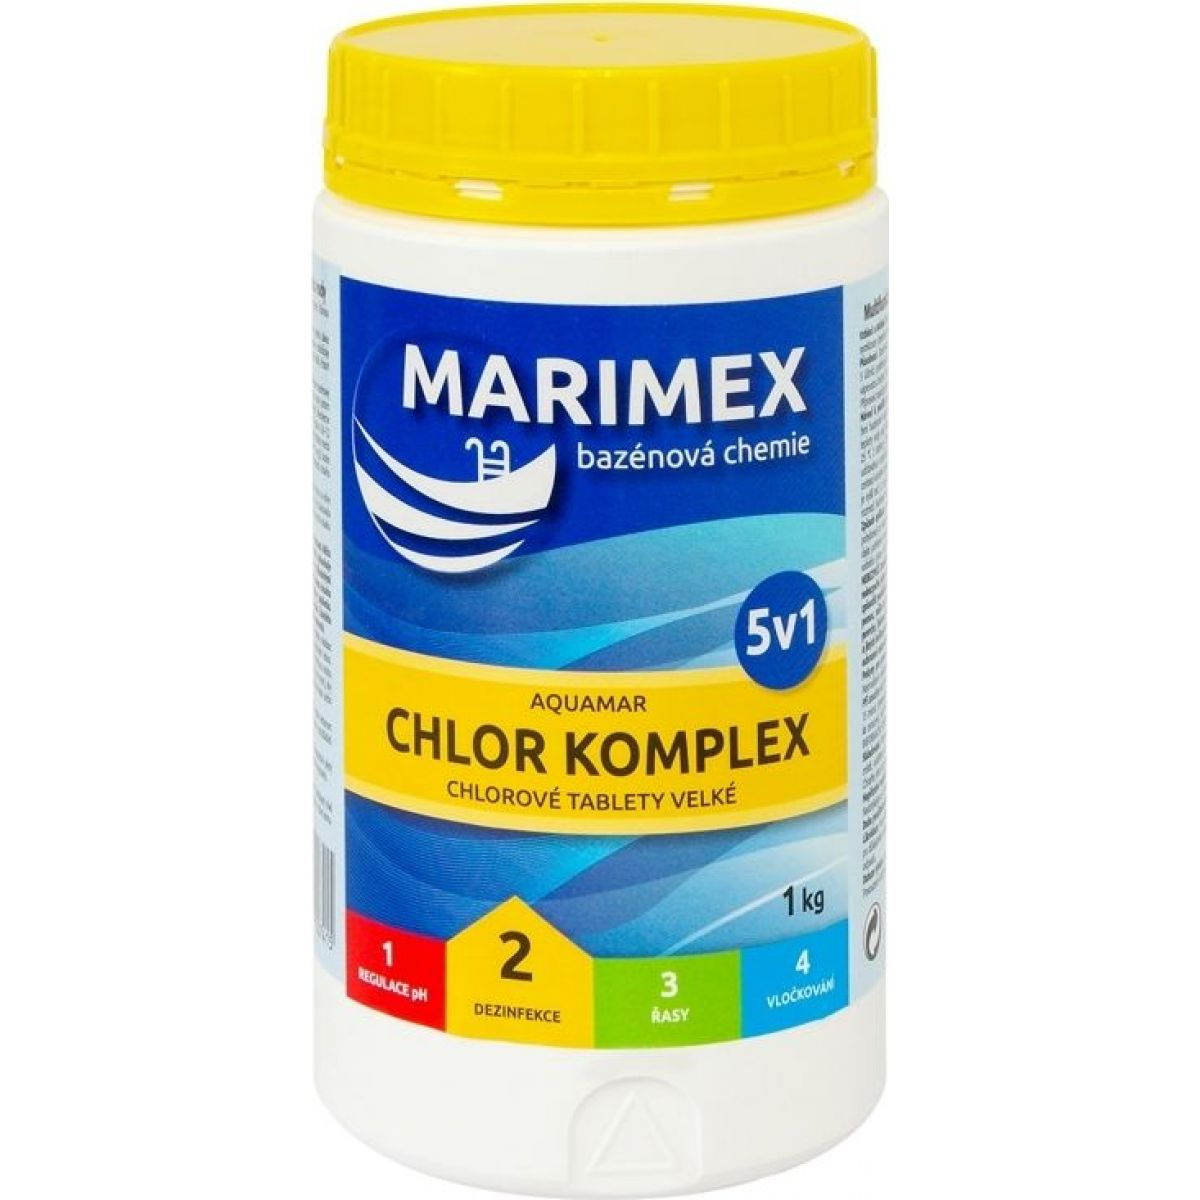 Marimex Chlór Komplex 5v1 1 kg